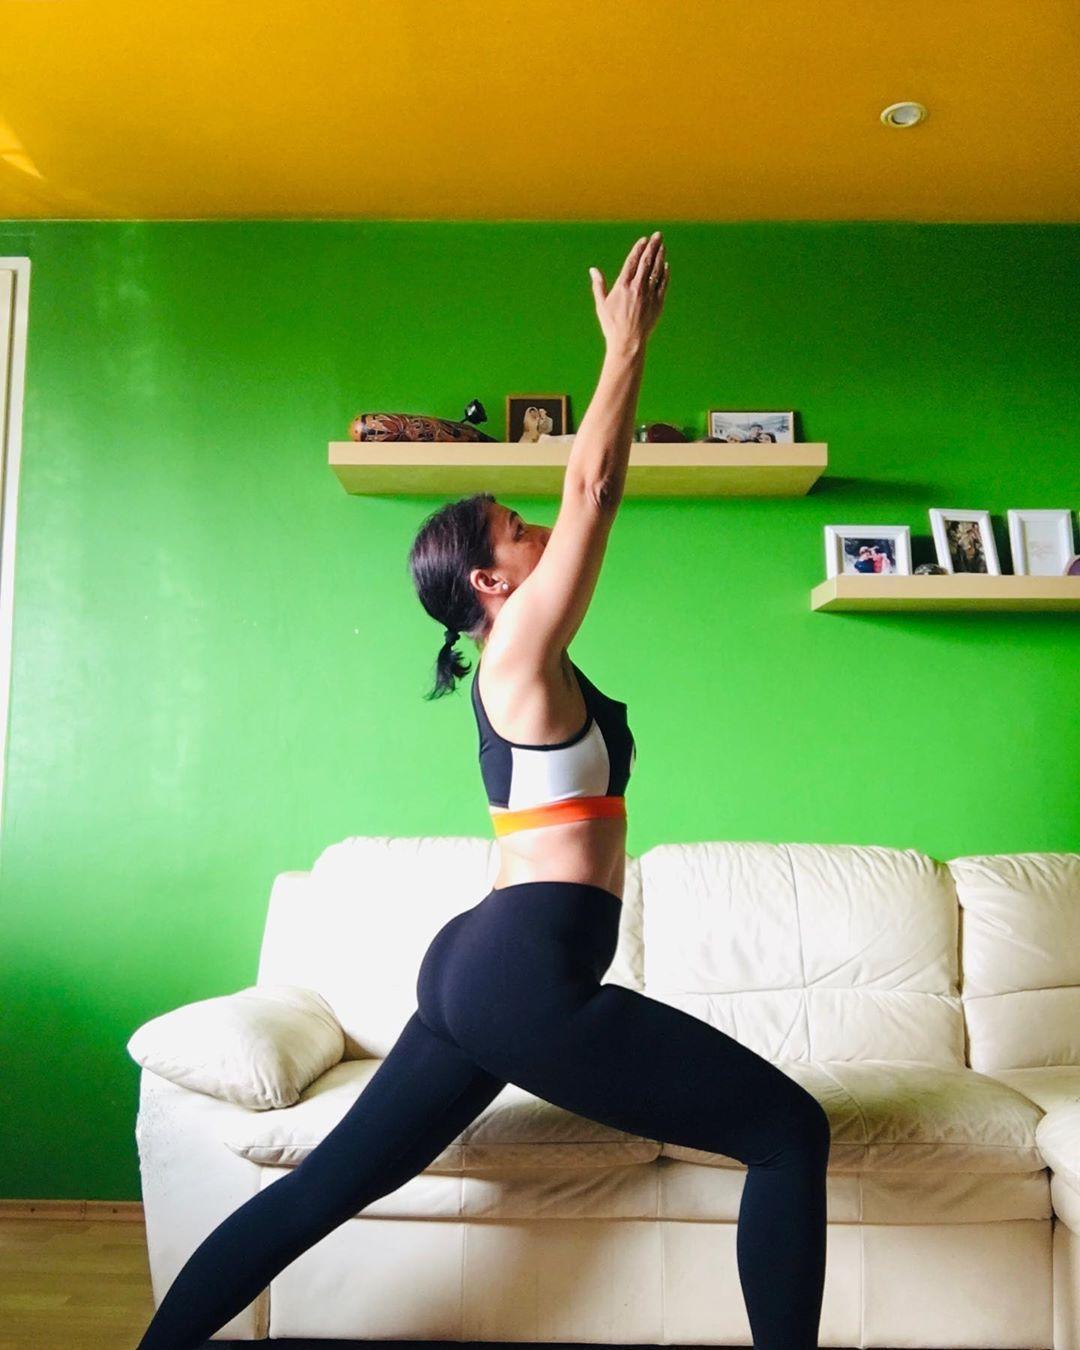 20 Yoga-Posen für Anfänger für Flexibilität - #ANFÄNGER #Flexibilität #für #Yoga #yogabenefits #yogaclothes #yogaforbeginners #yogainspiration #yogalifestyle #yogameditation #yogaposes #yogaposesforbeginners #yogaworkout #YogaPosen